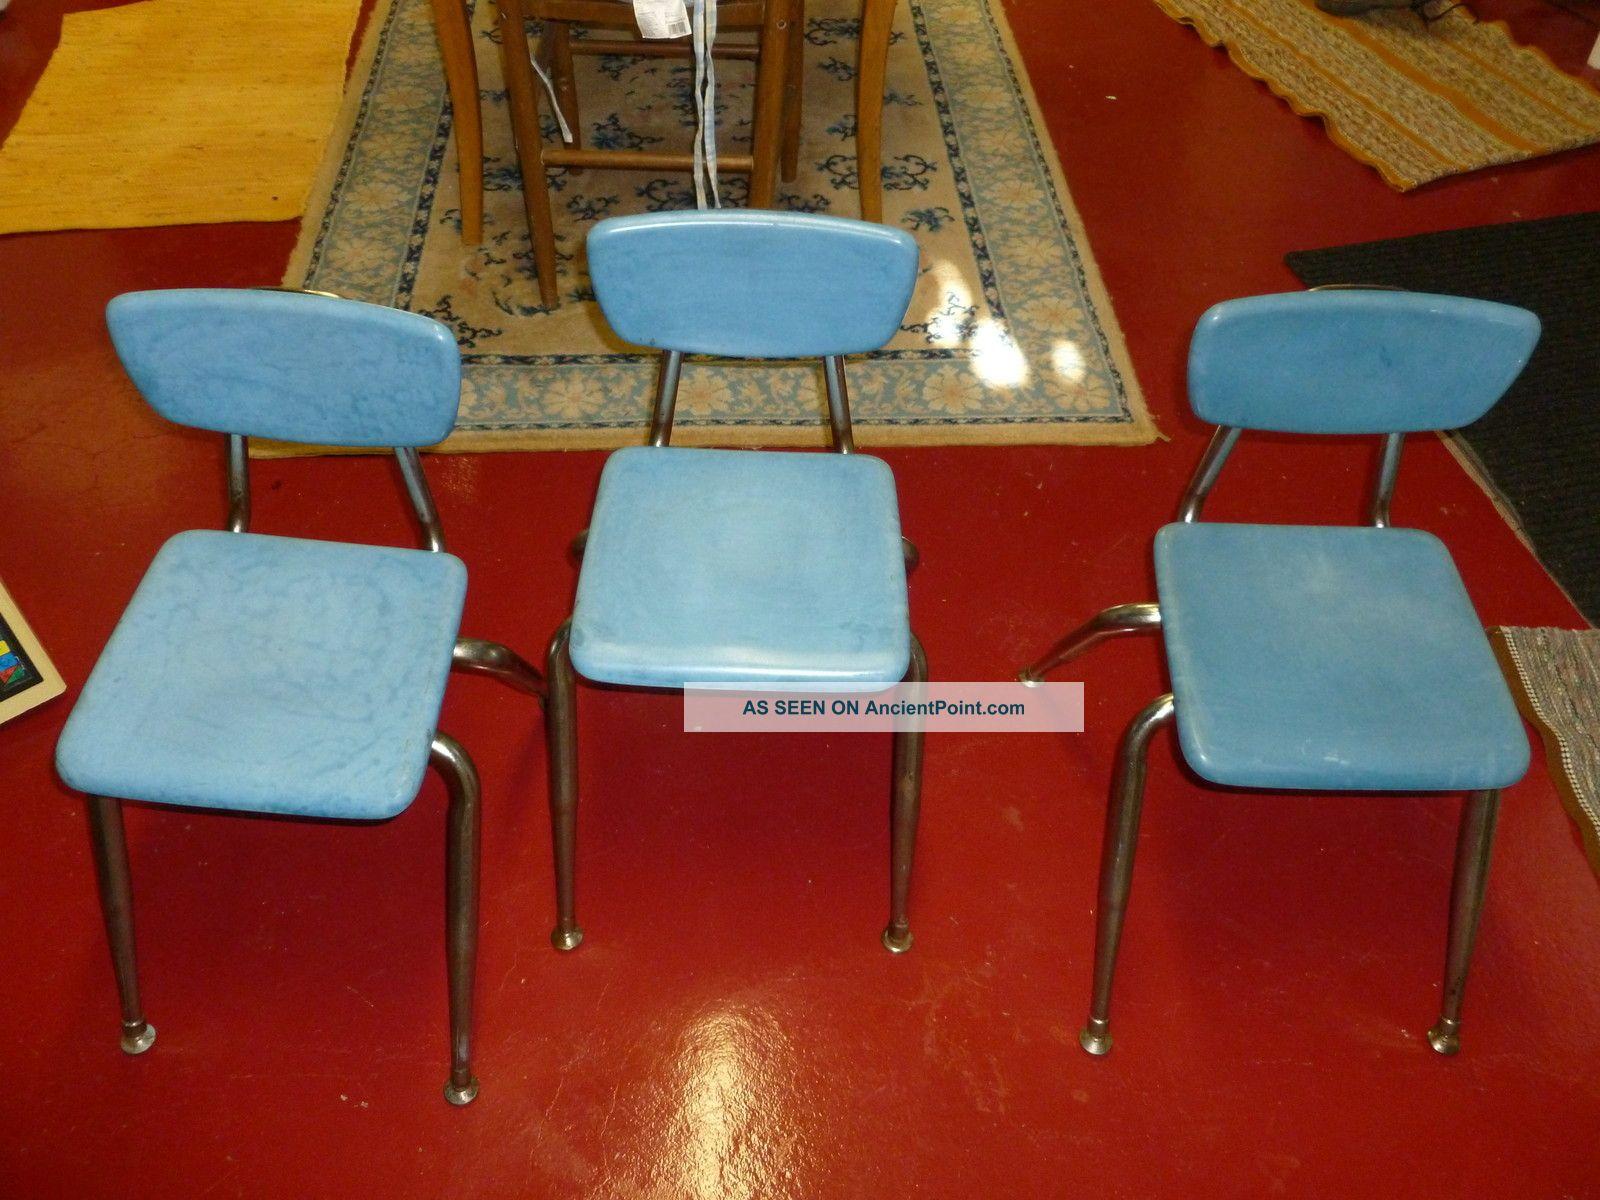 Vintage Mid Century Modern Virco Childrens Chairs - Hard Plastic W Chrome 3 Post-1950 photo